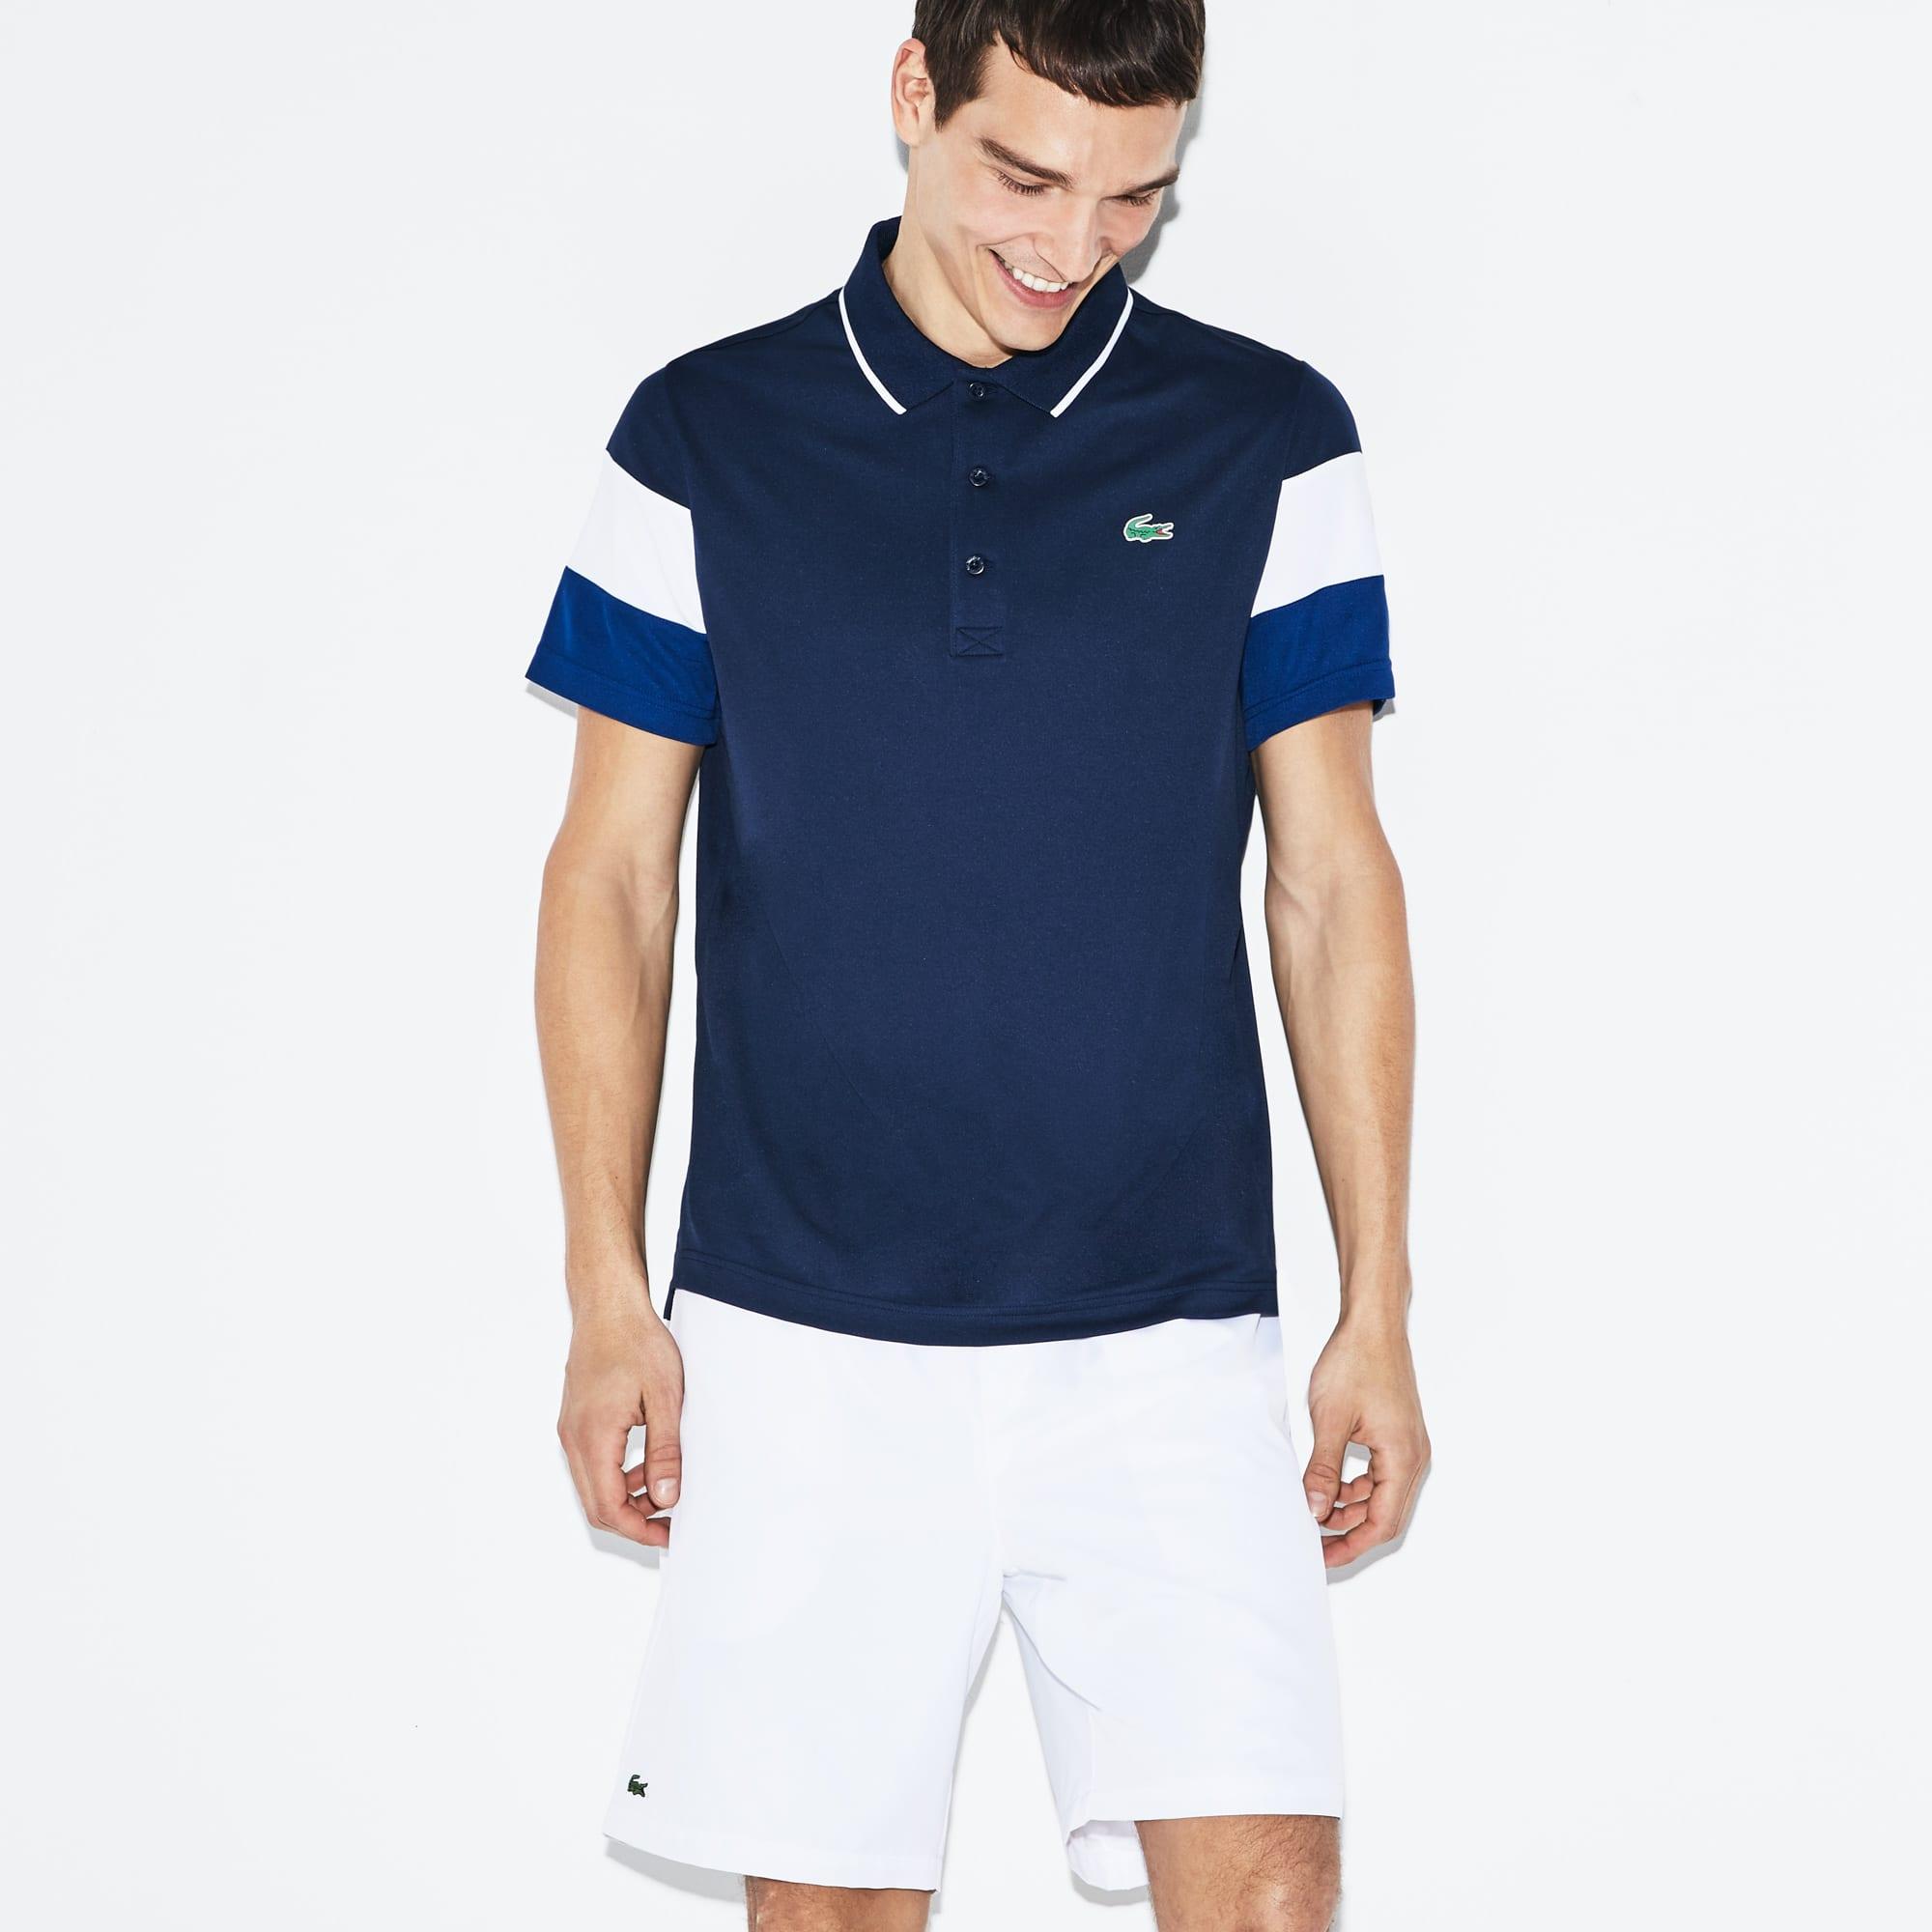 Men's Lacoste SPORT Colorblock Sleeves Technical Piqué Polo Shirt